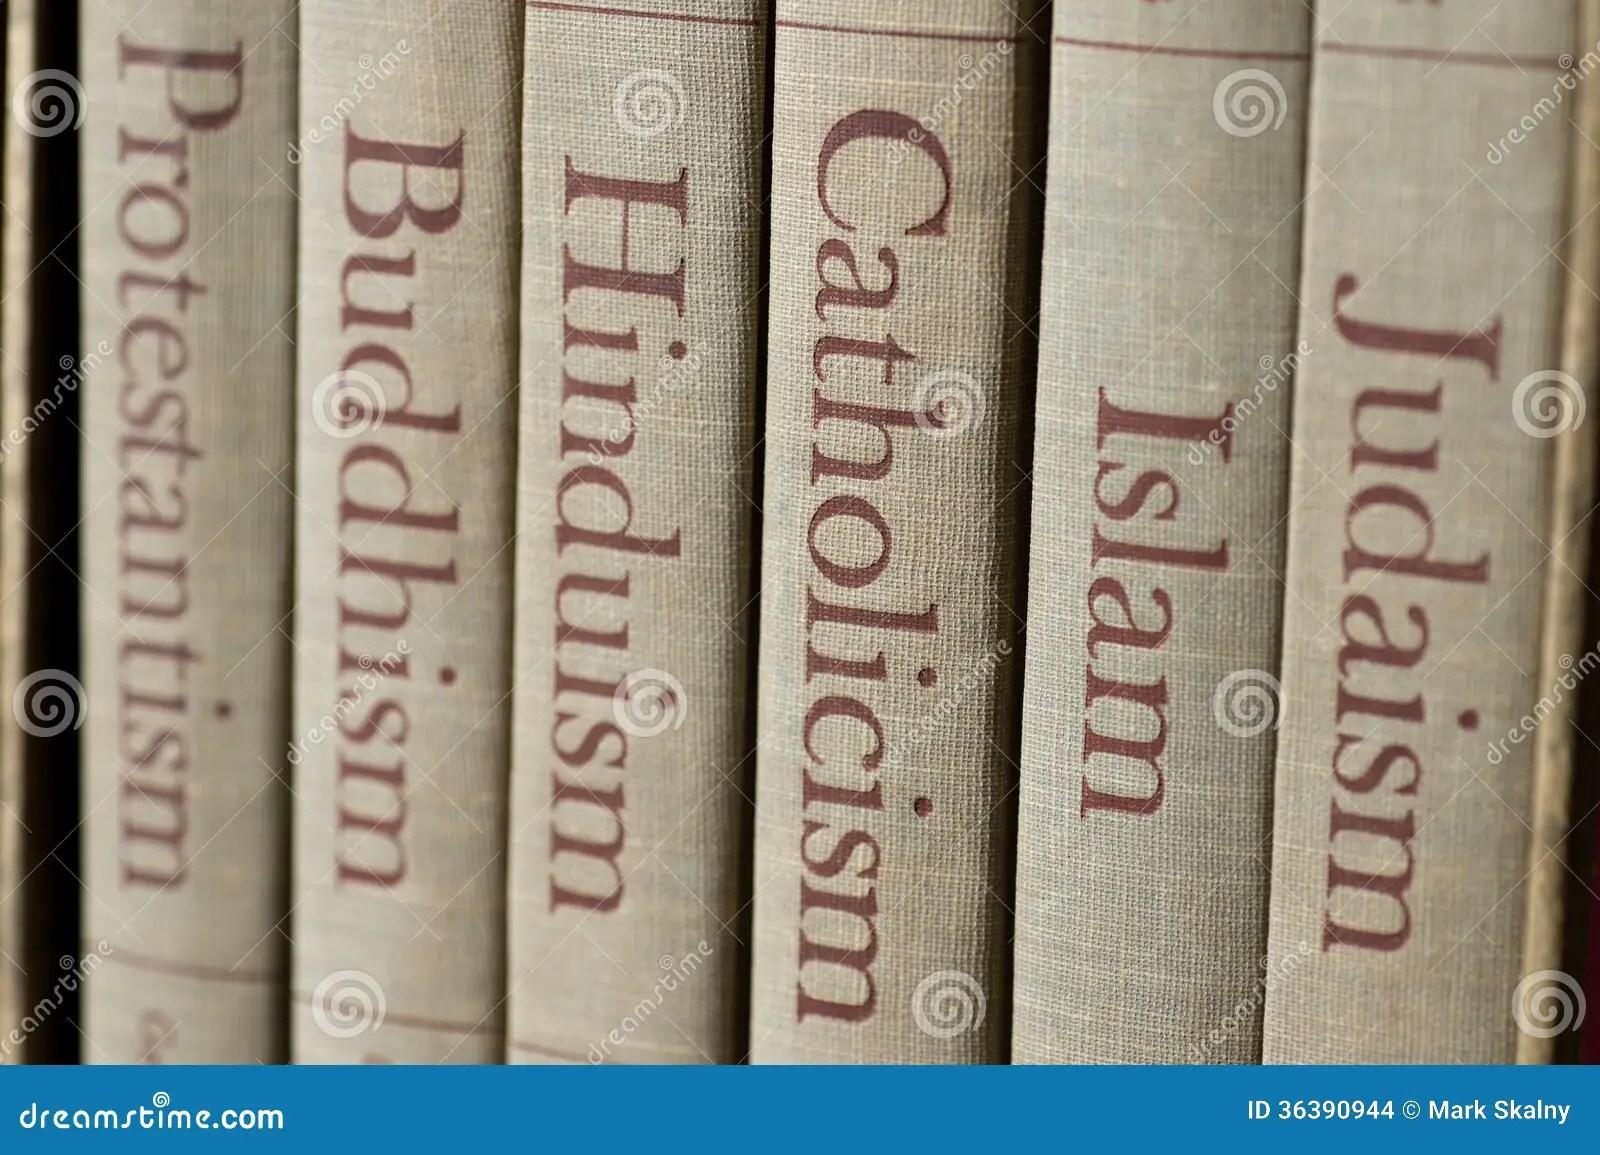 Major World Religions Stock Photo Image Of Faith Several